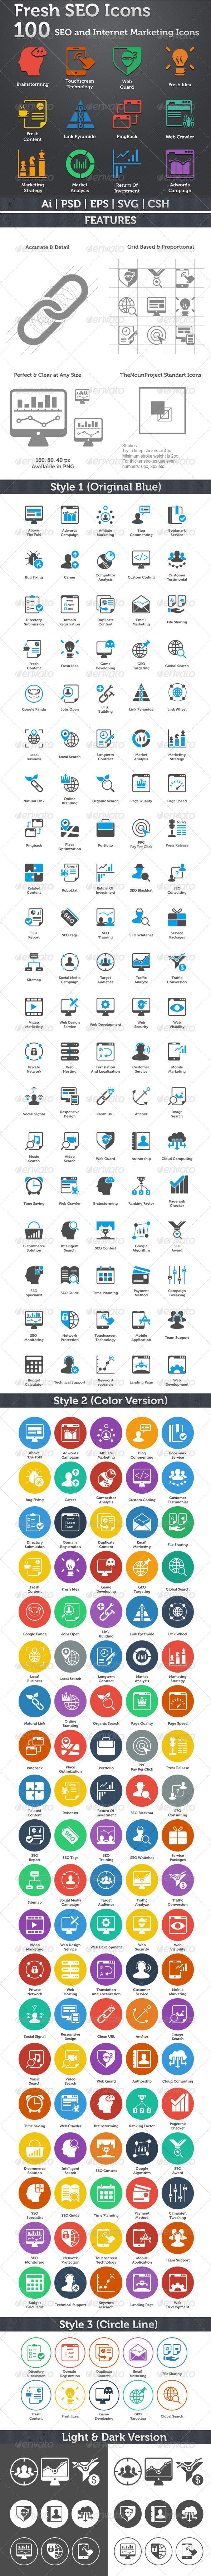 GraphicRiver Fresh SEO Icons SEO and Internet Marketing Icons 5049345